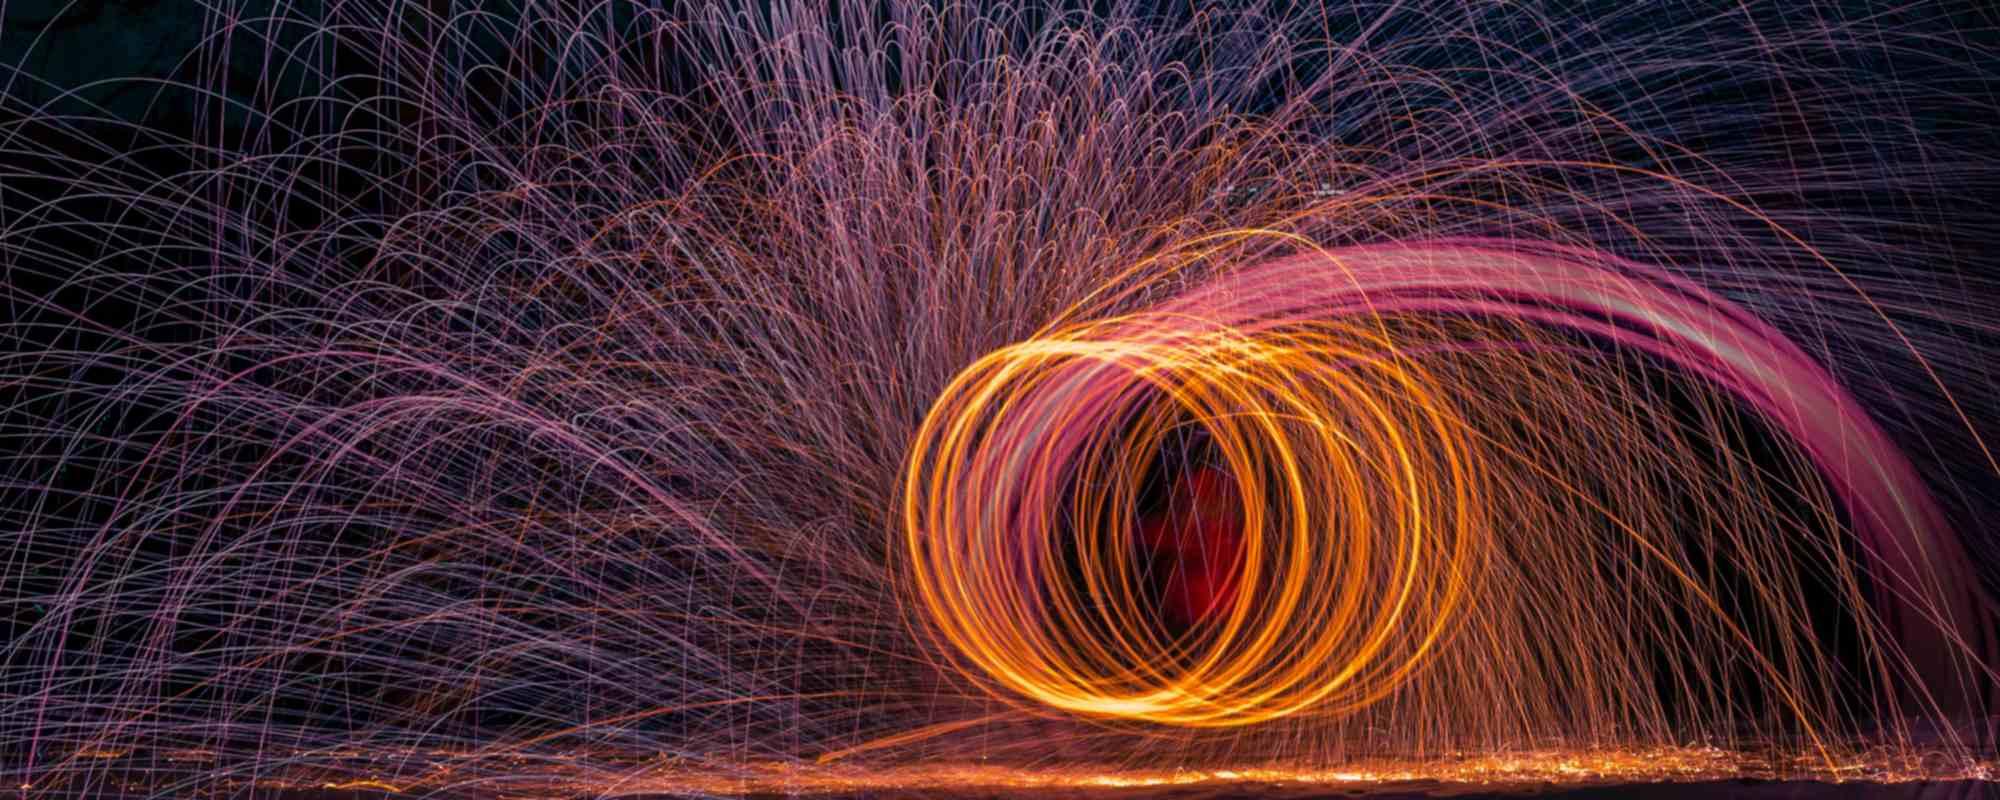 MetaShift Hero Image of fireworks